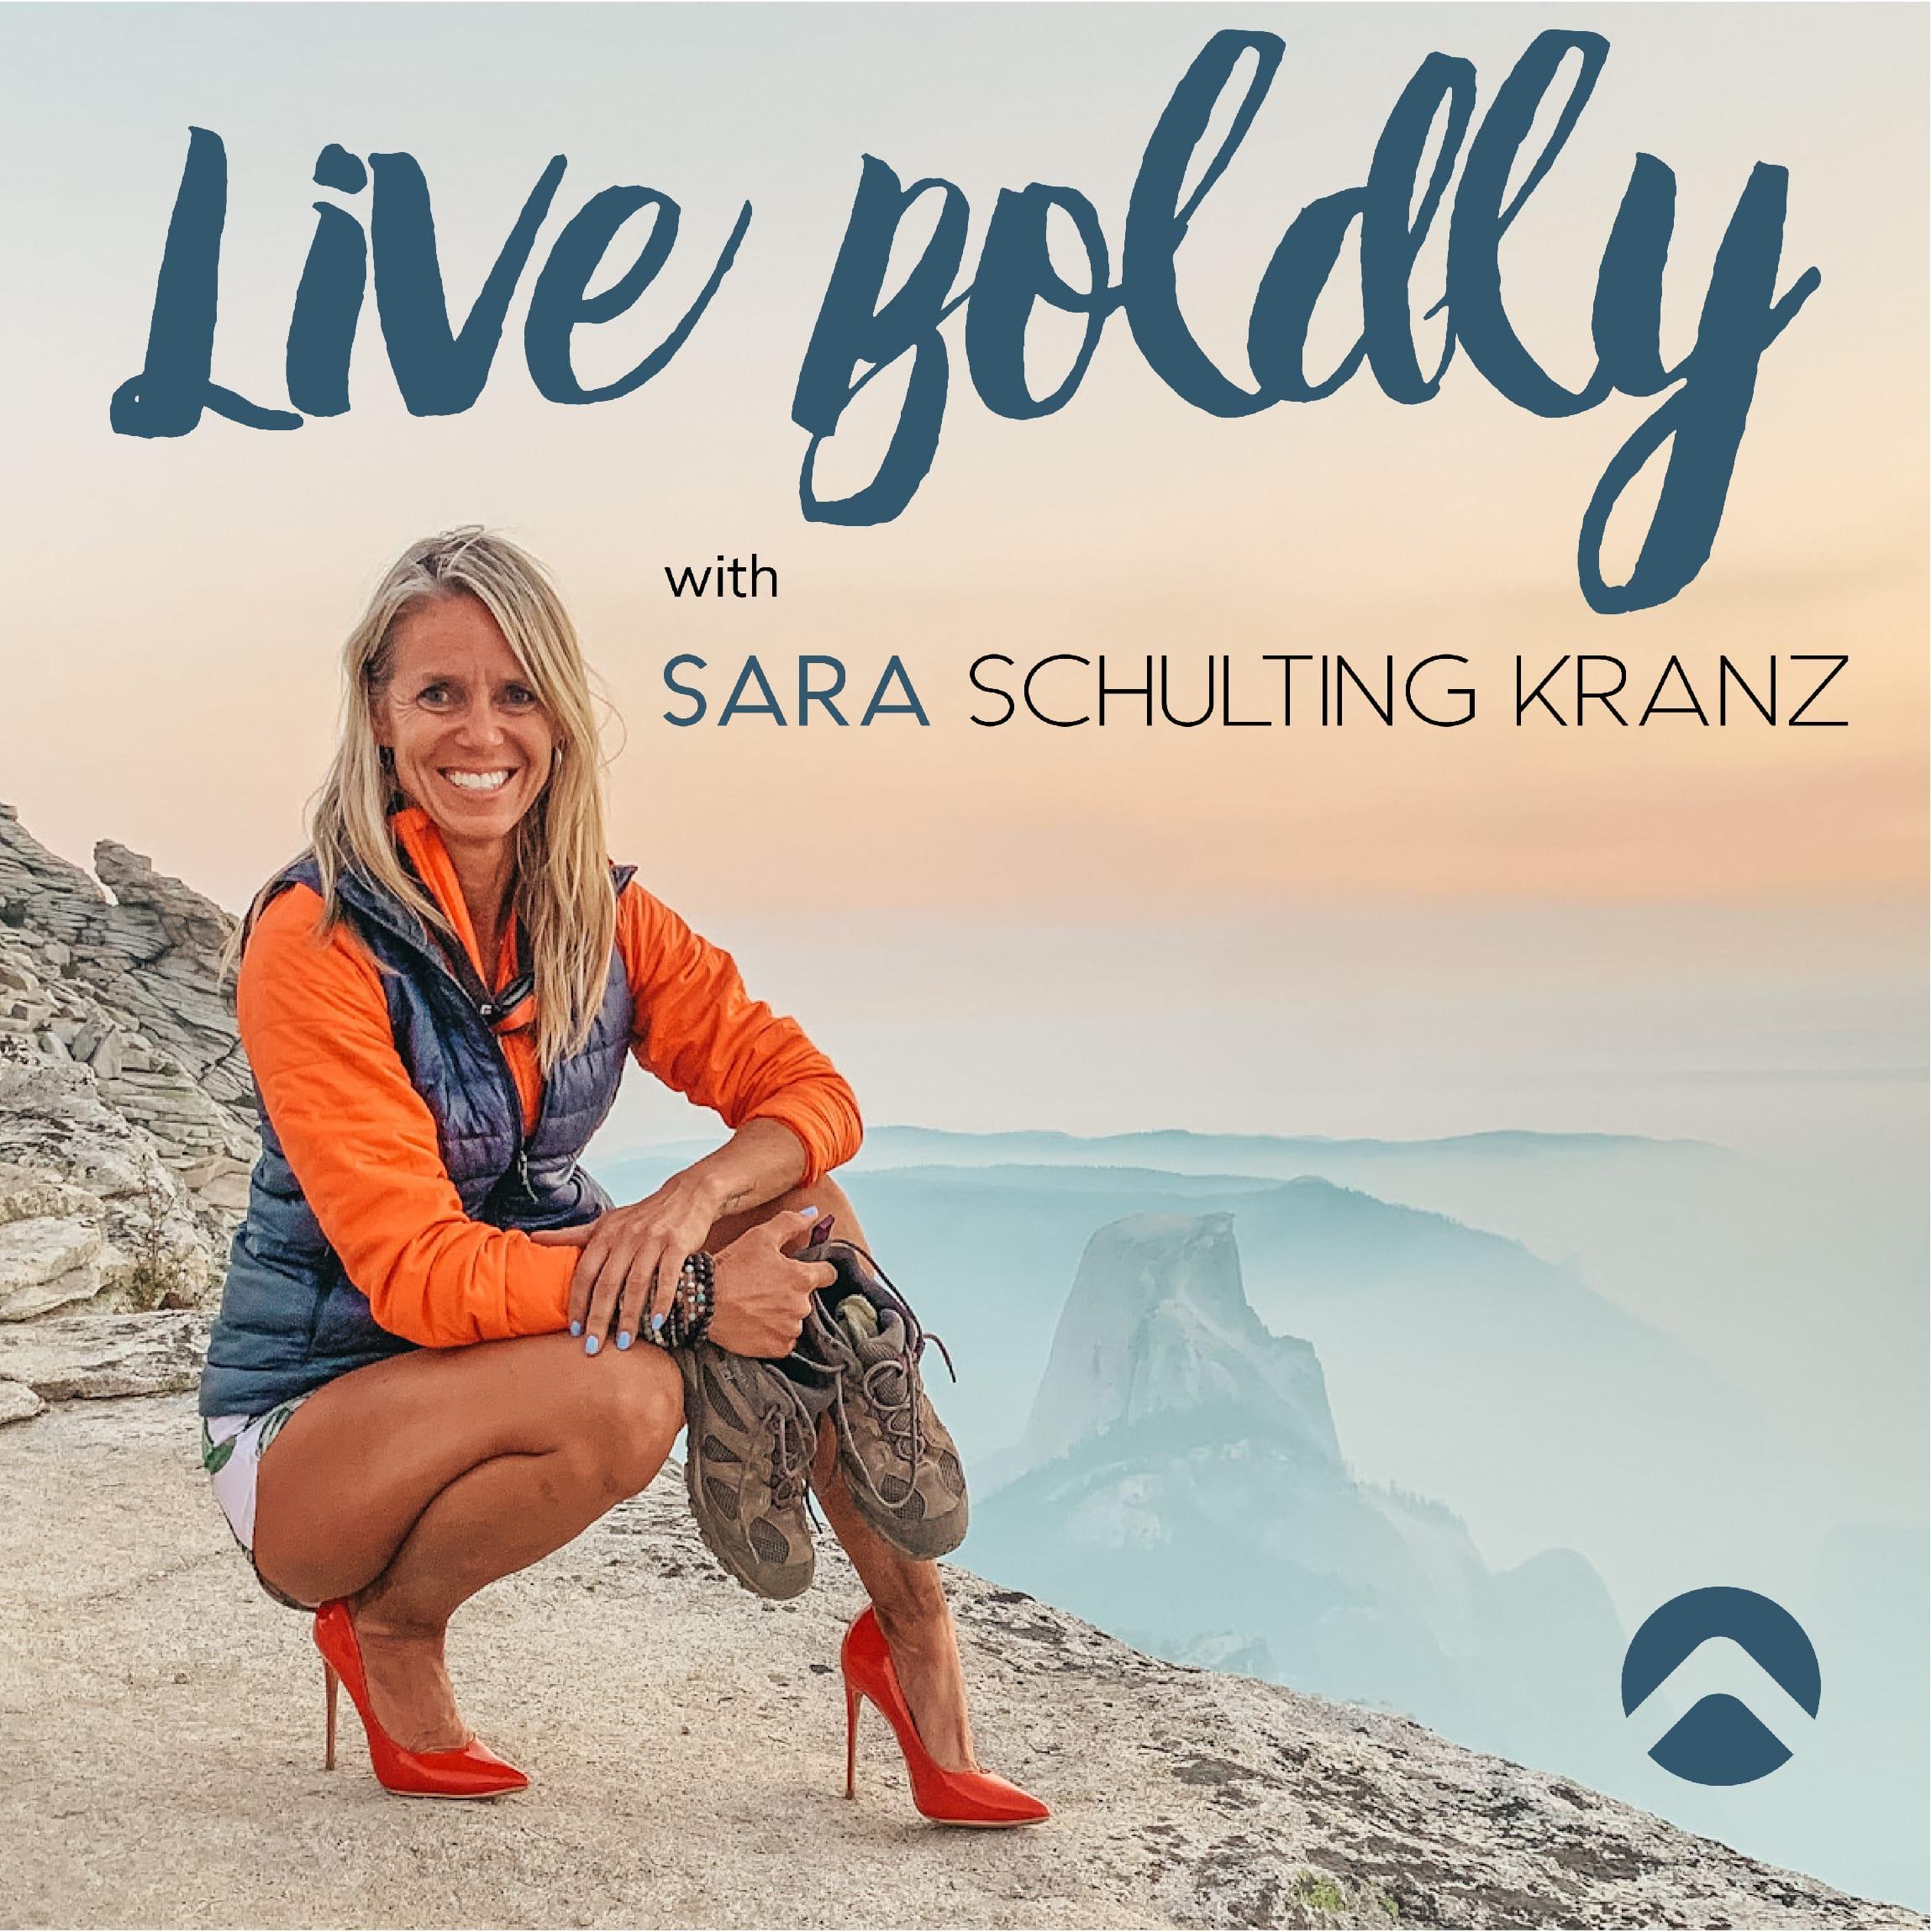 Sara_Schulting_Kranz_Logo_Branding_By_Stellen_Design_Live Boldly_Podcast